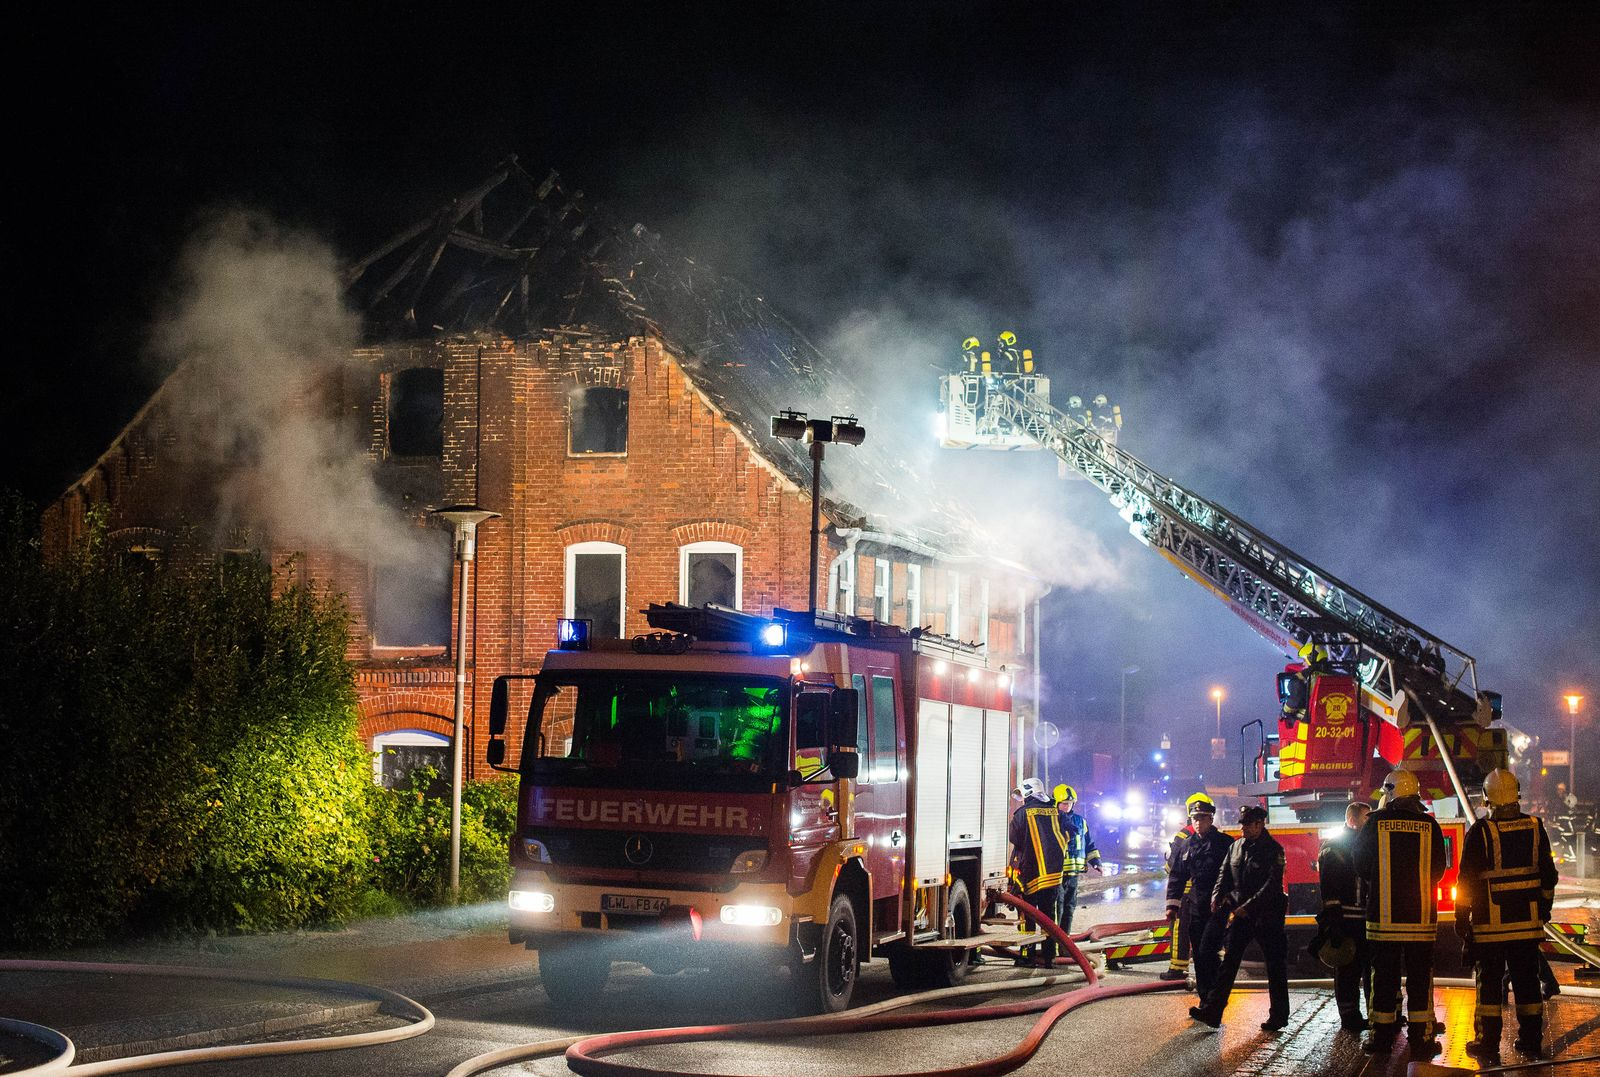 Geplante Flüchtlingsunterkunft abgebrannt